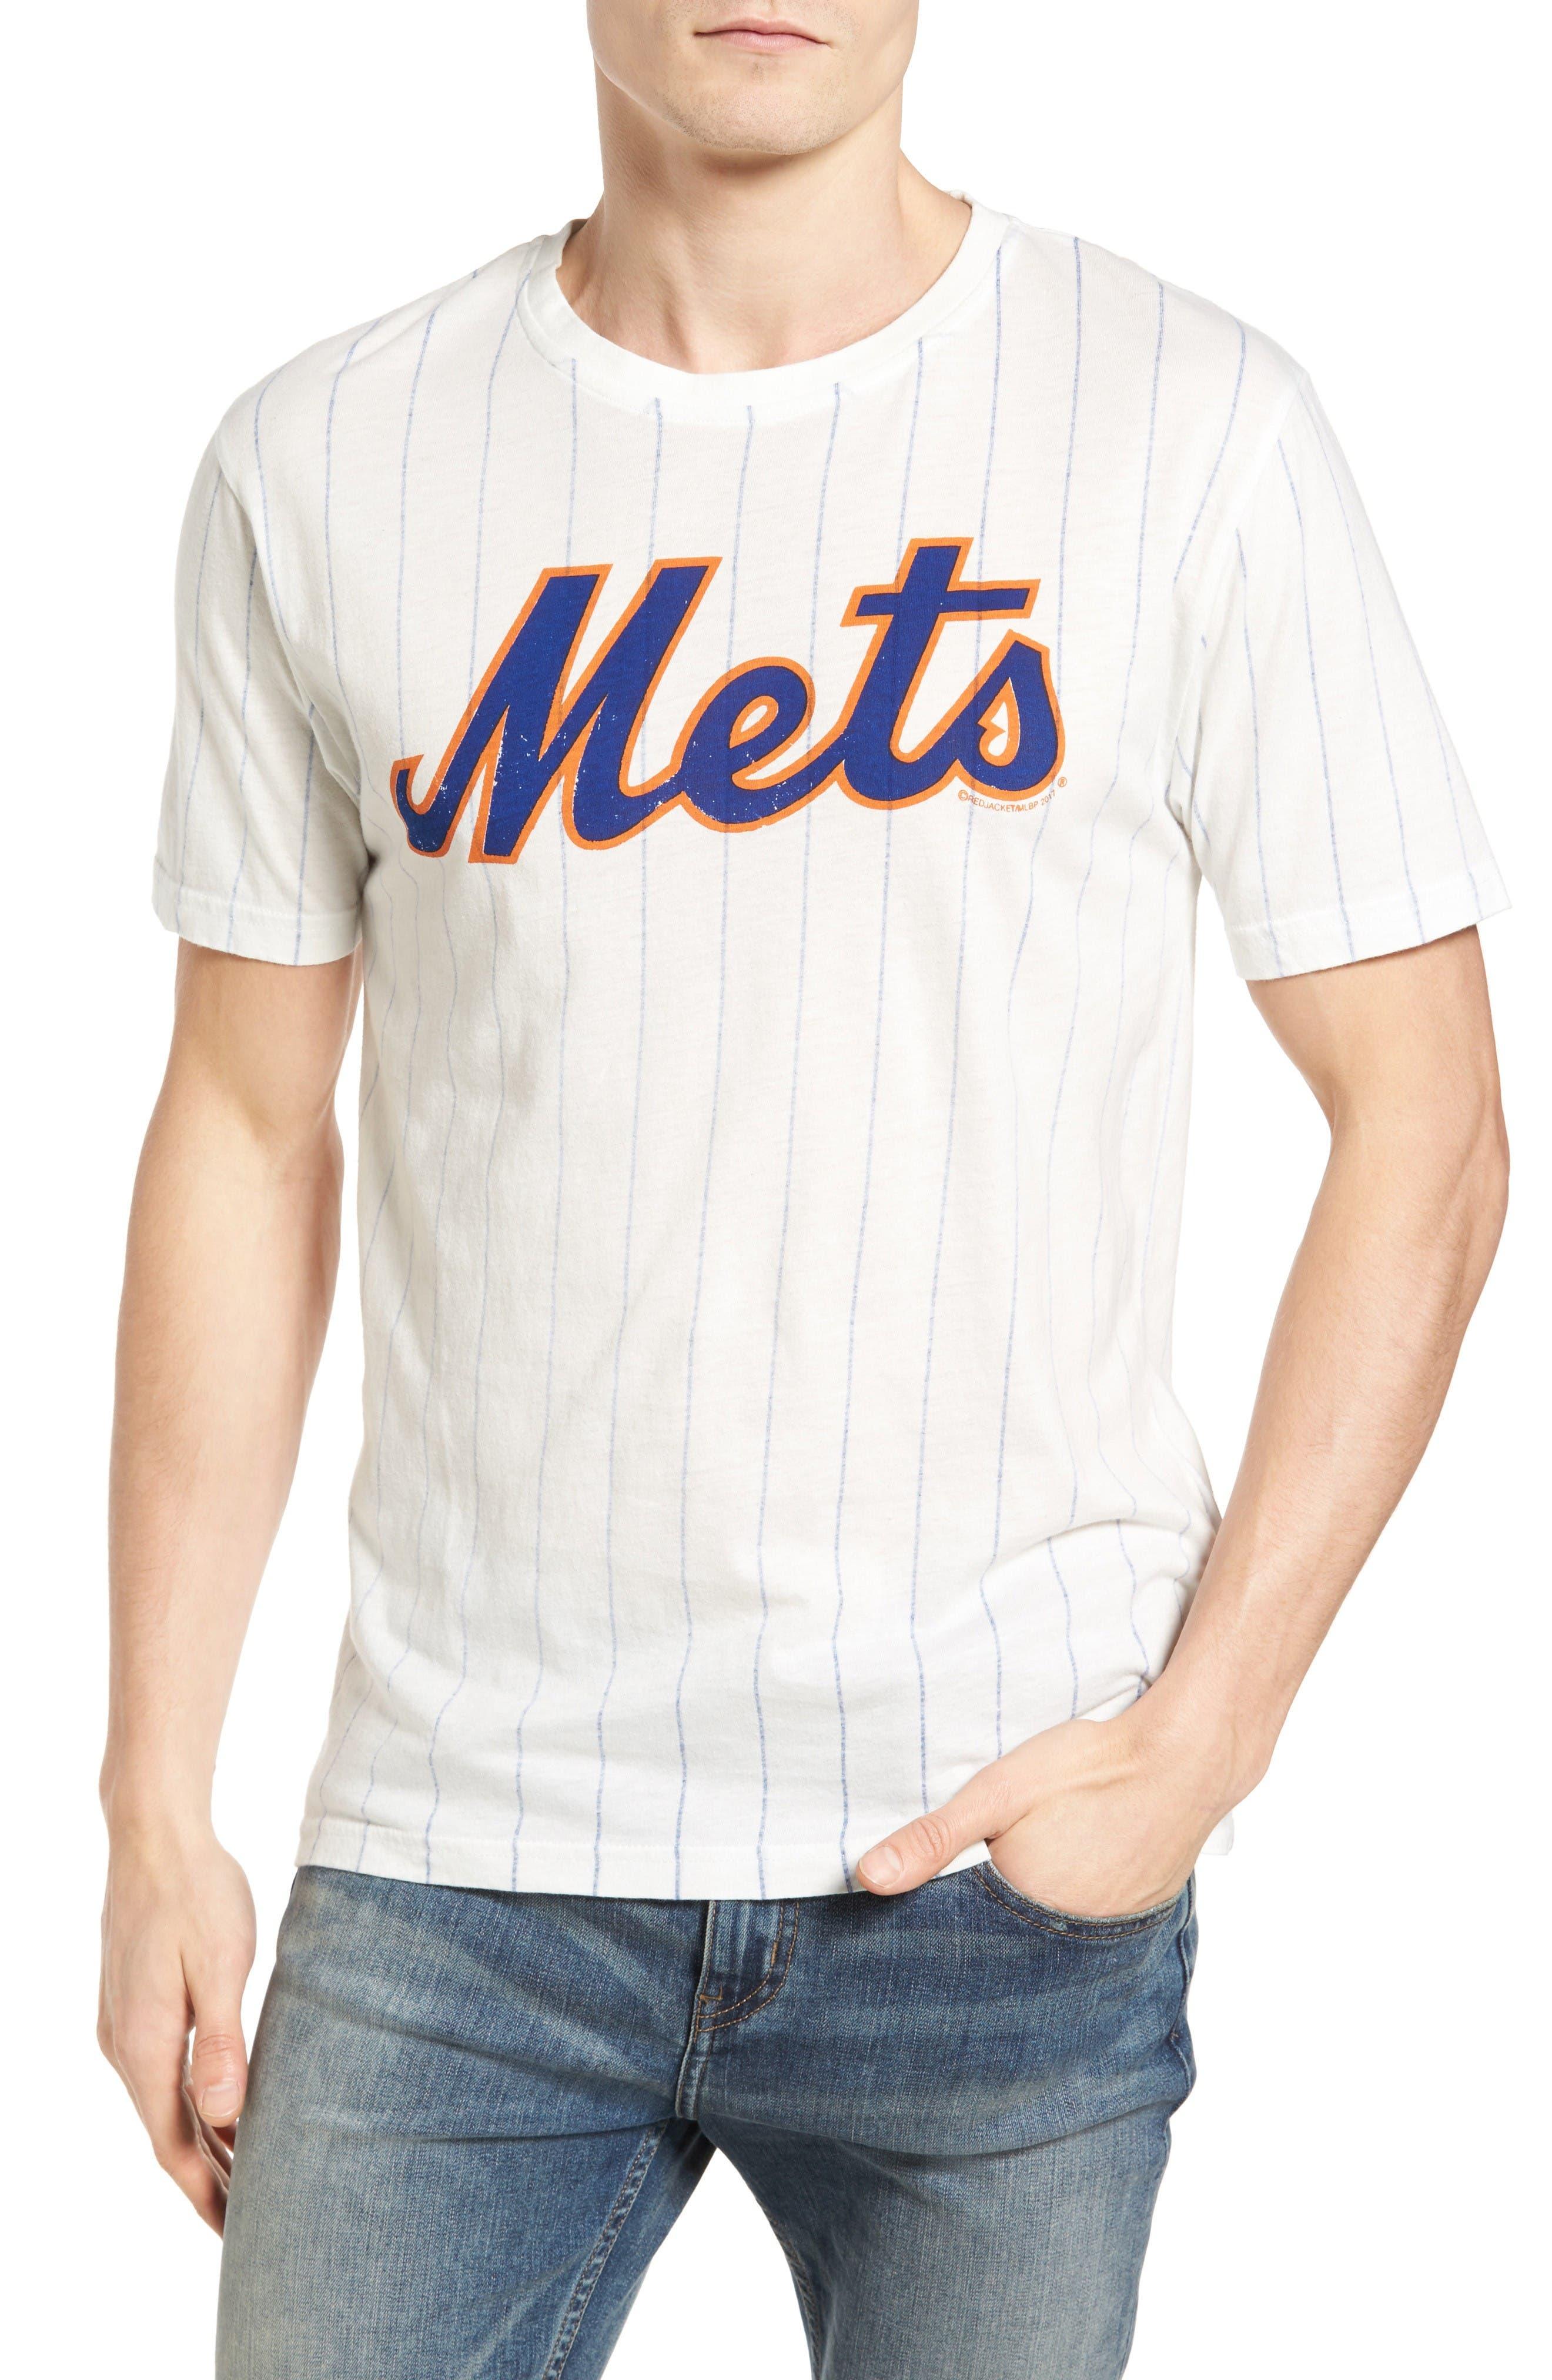 Brass Tack New York Mets T-Shirt,                         Main,                         color, Cream/ Royal